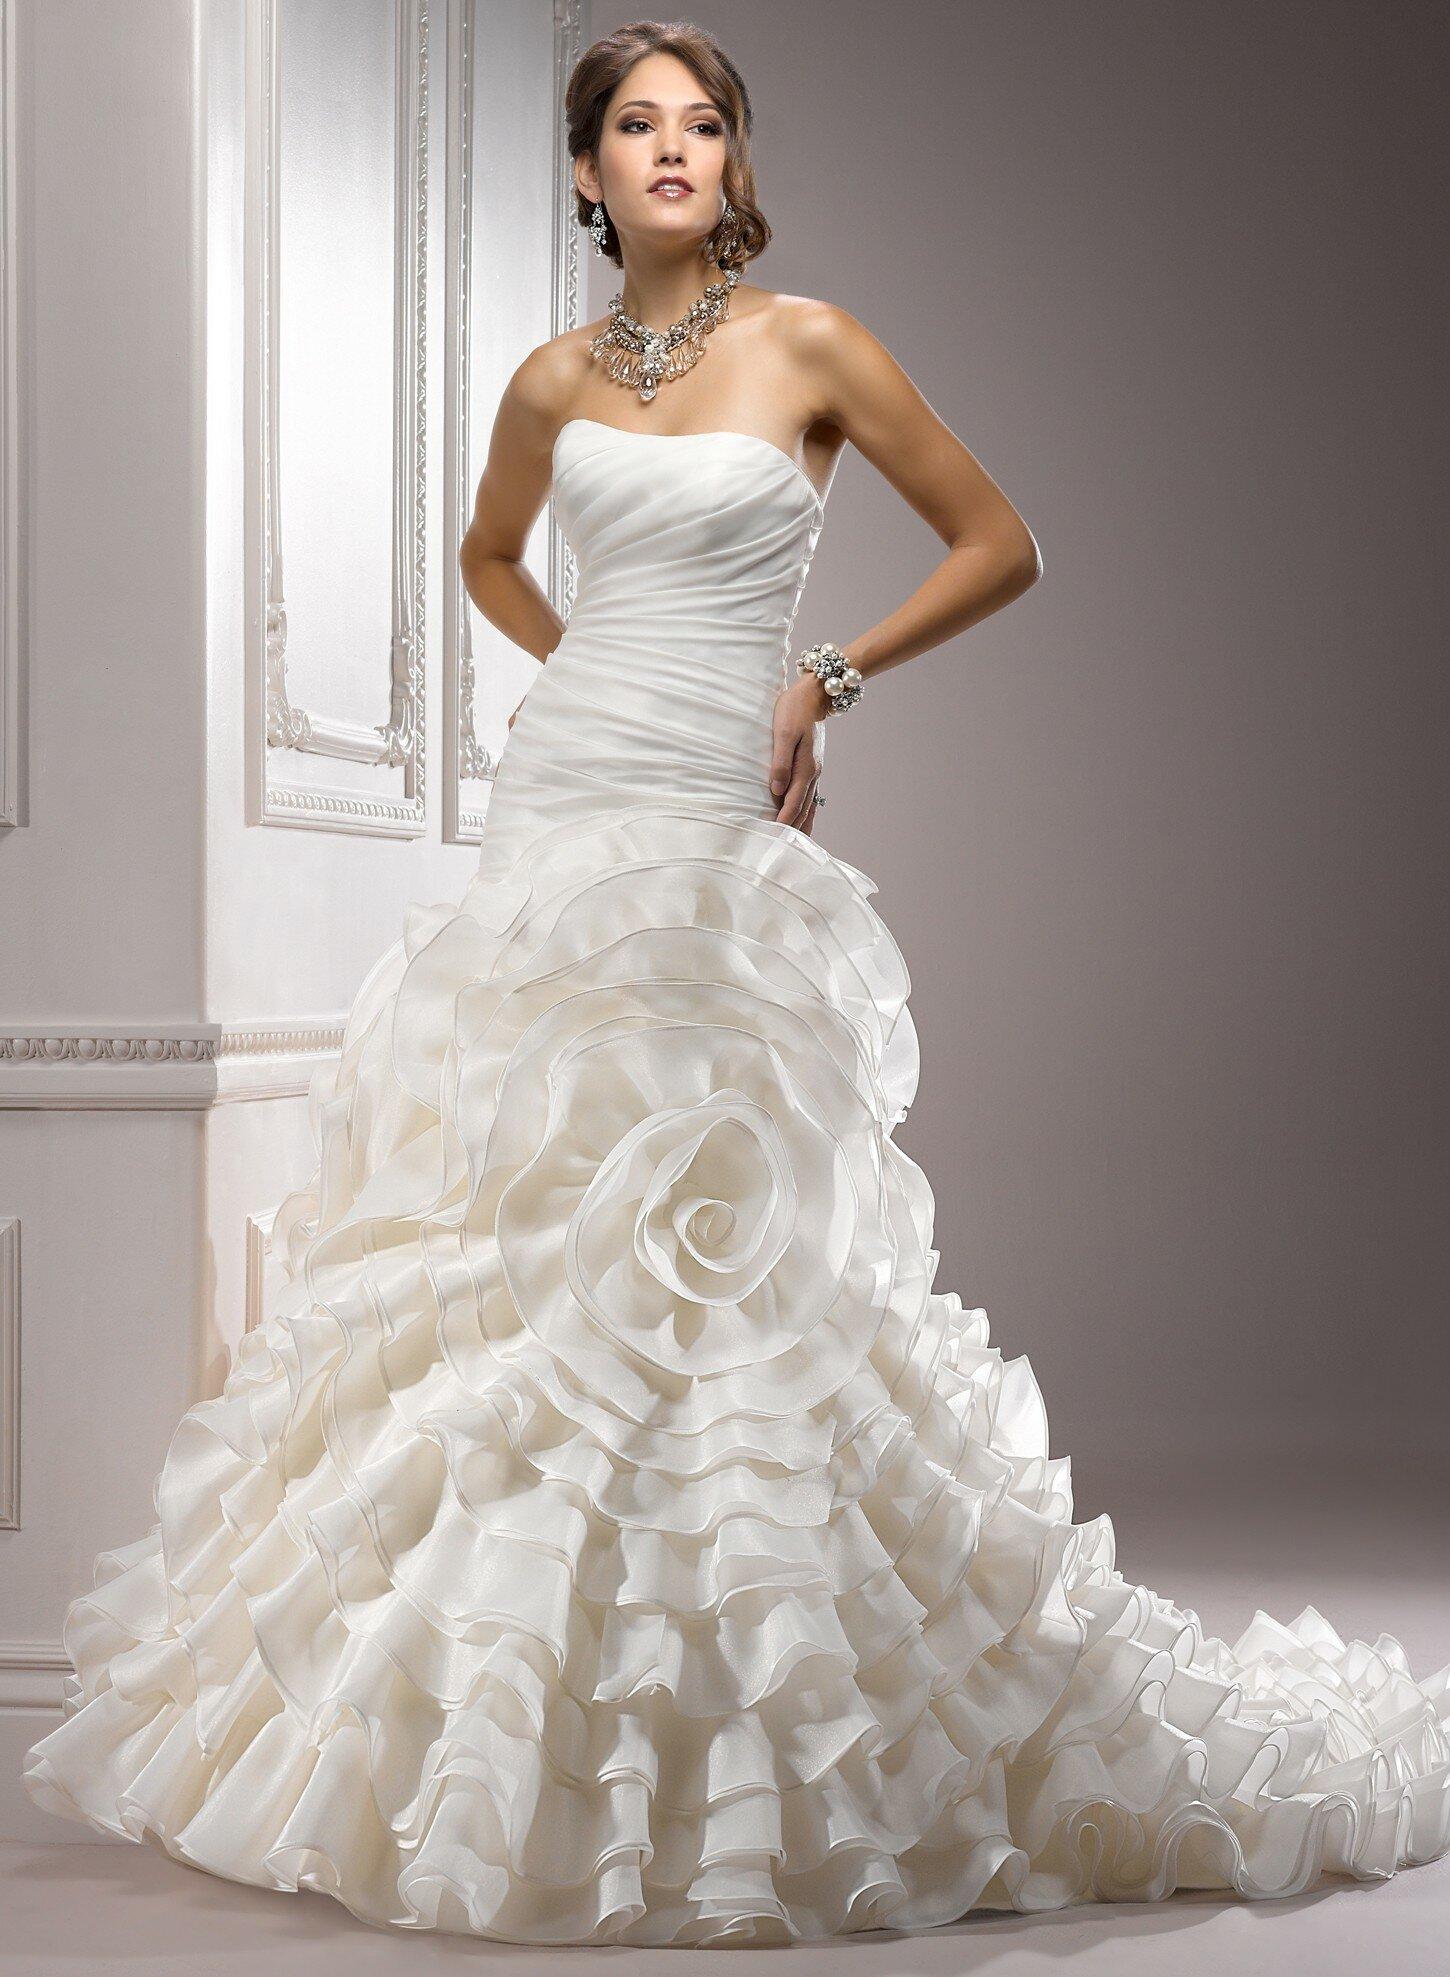 wedding dresses with corset top wedding dress corset top Wedding dresses with corset top photo 5